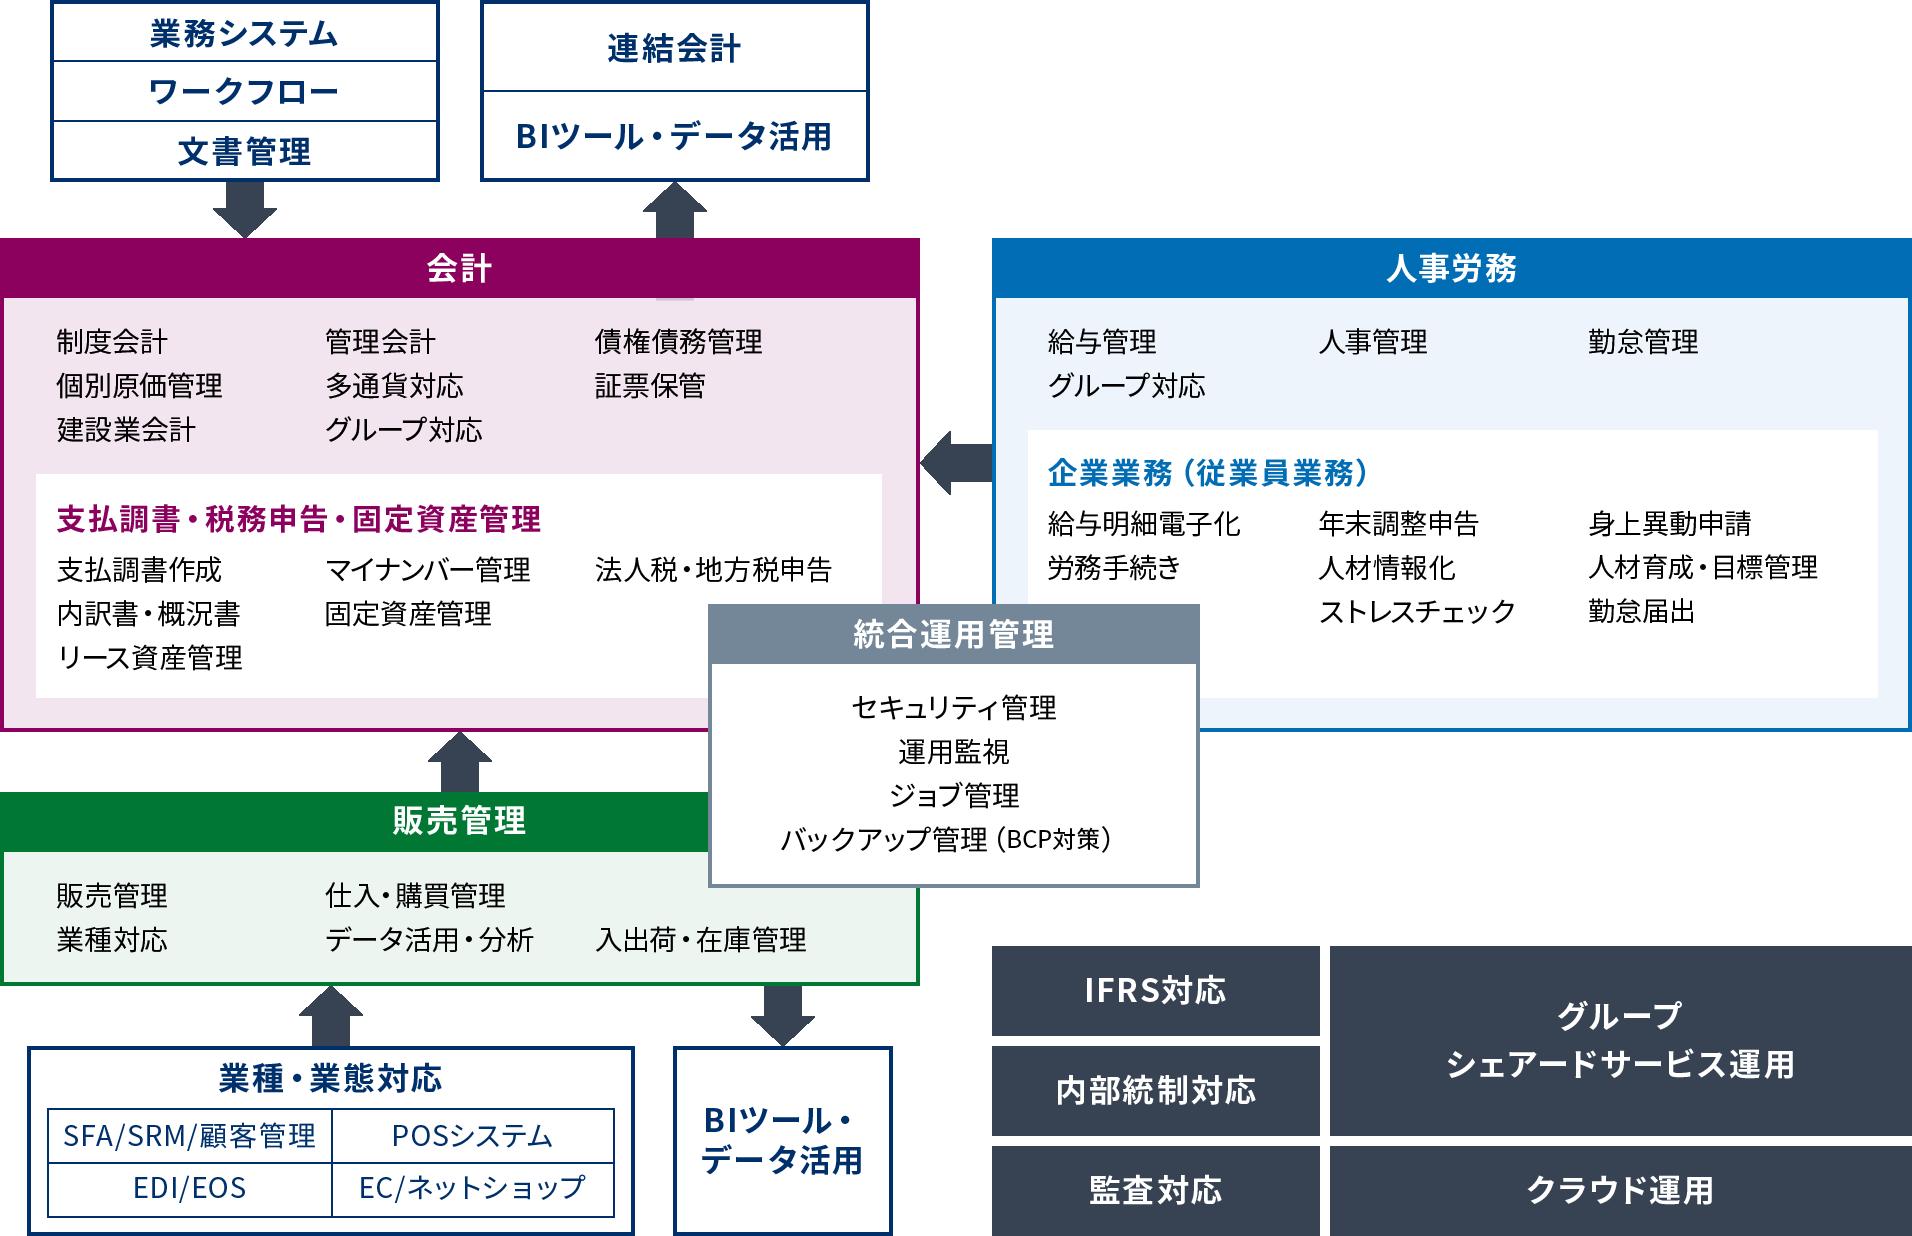 ERP 全体構成図及び連携図(簡易版)